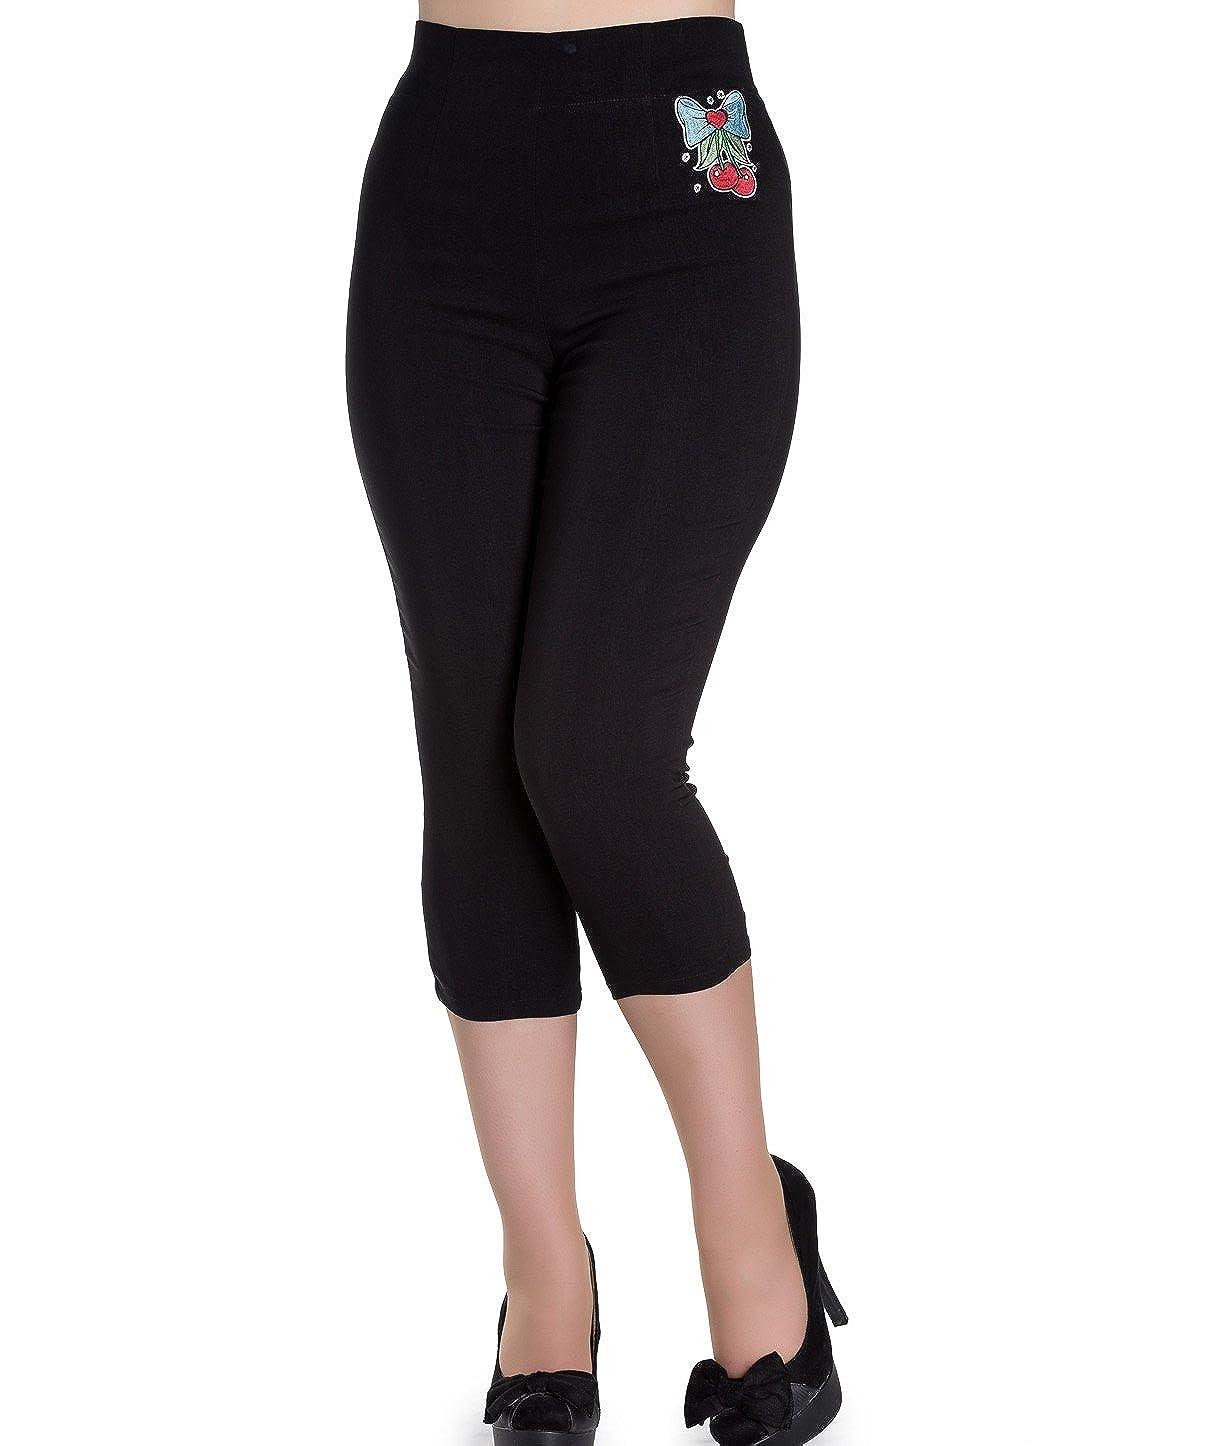 Hell Bunny 50s Black Pedal Pushers ANNA Capris Capri Trousers Cherry